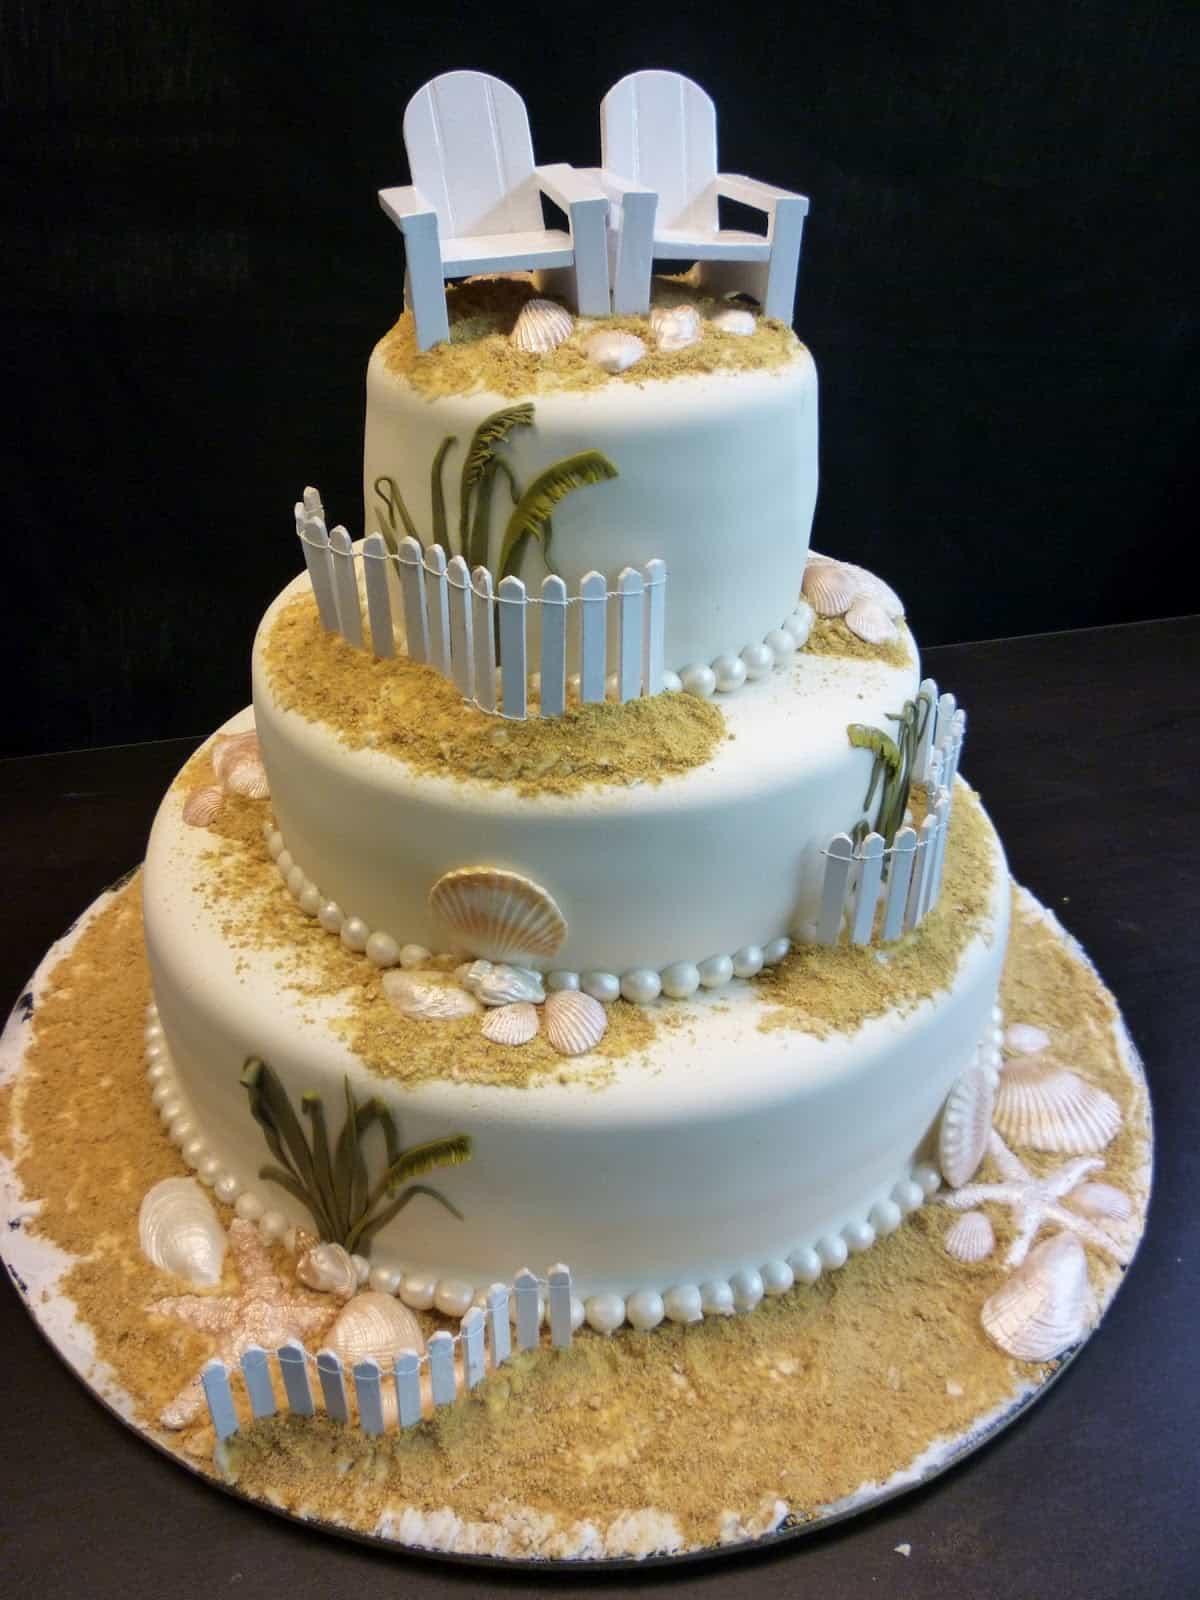 Scrumptious Seaside Groom's Wedding Cakes (Image 10 of 13)